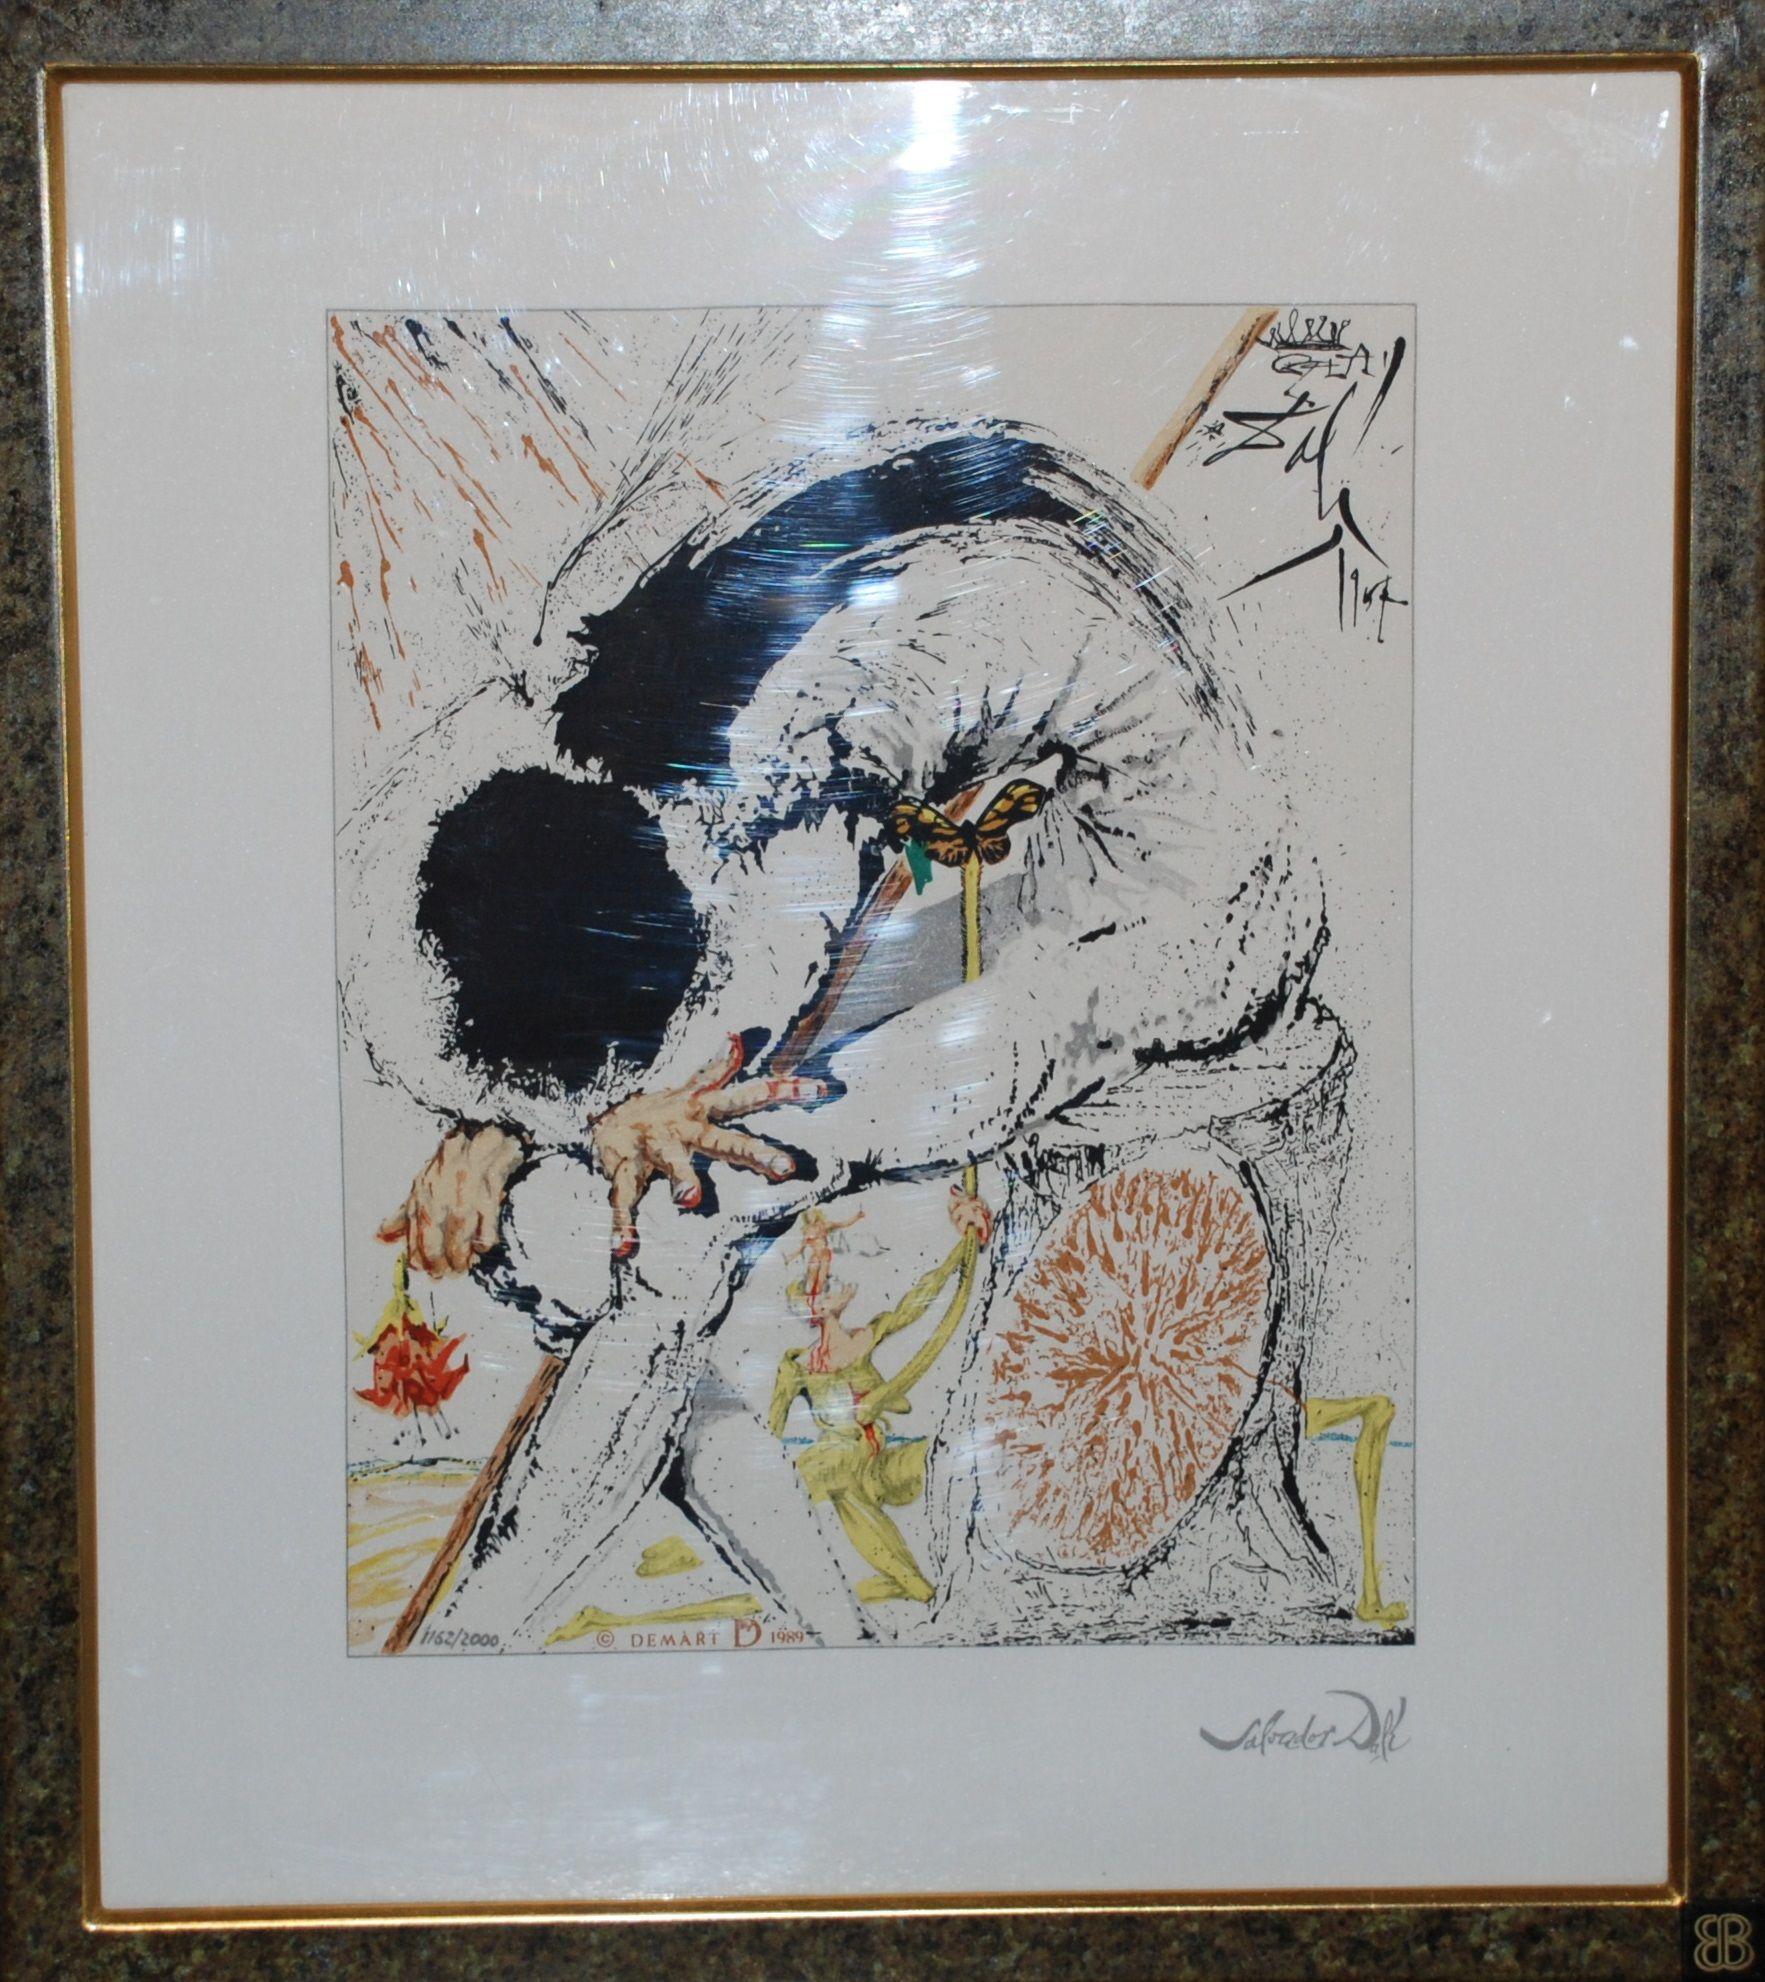 Salvador Dali (after) - Don Quichotte